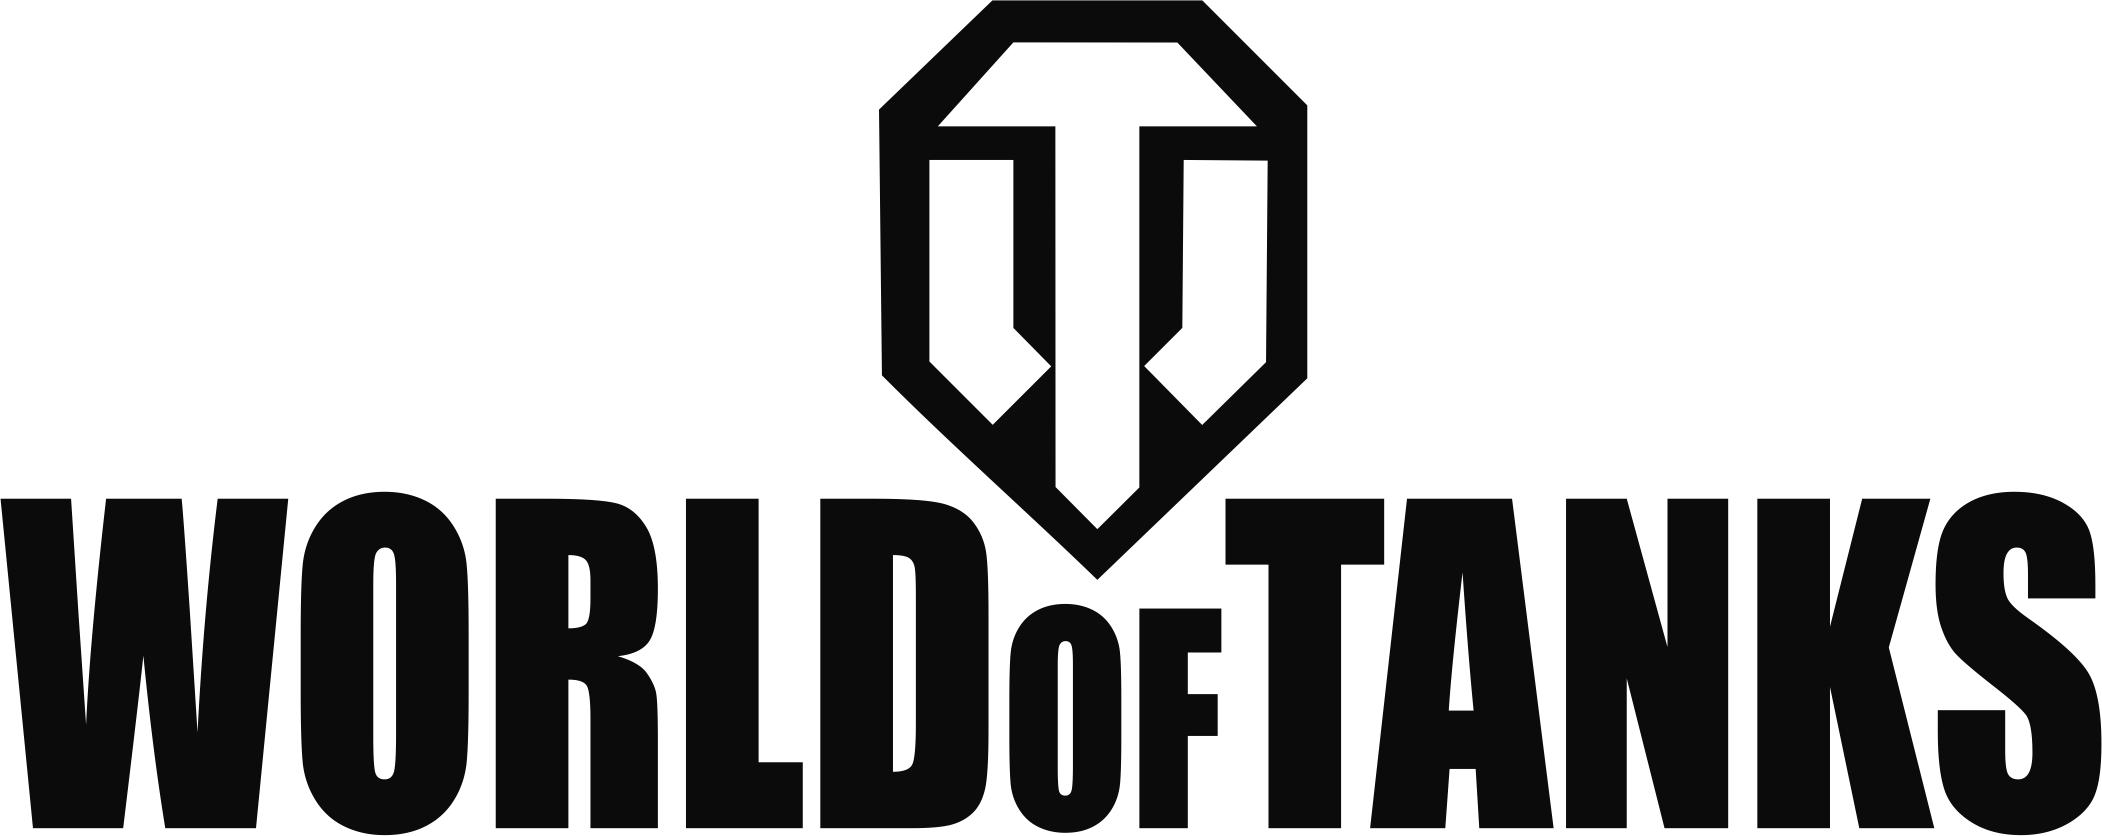 World of Tanks Vector Logo CDR File